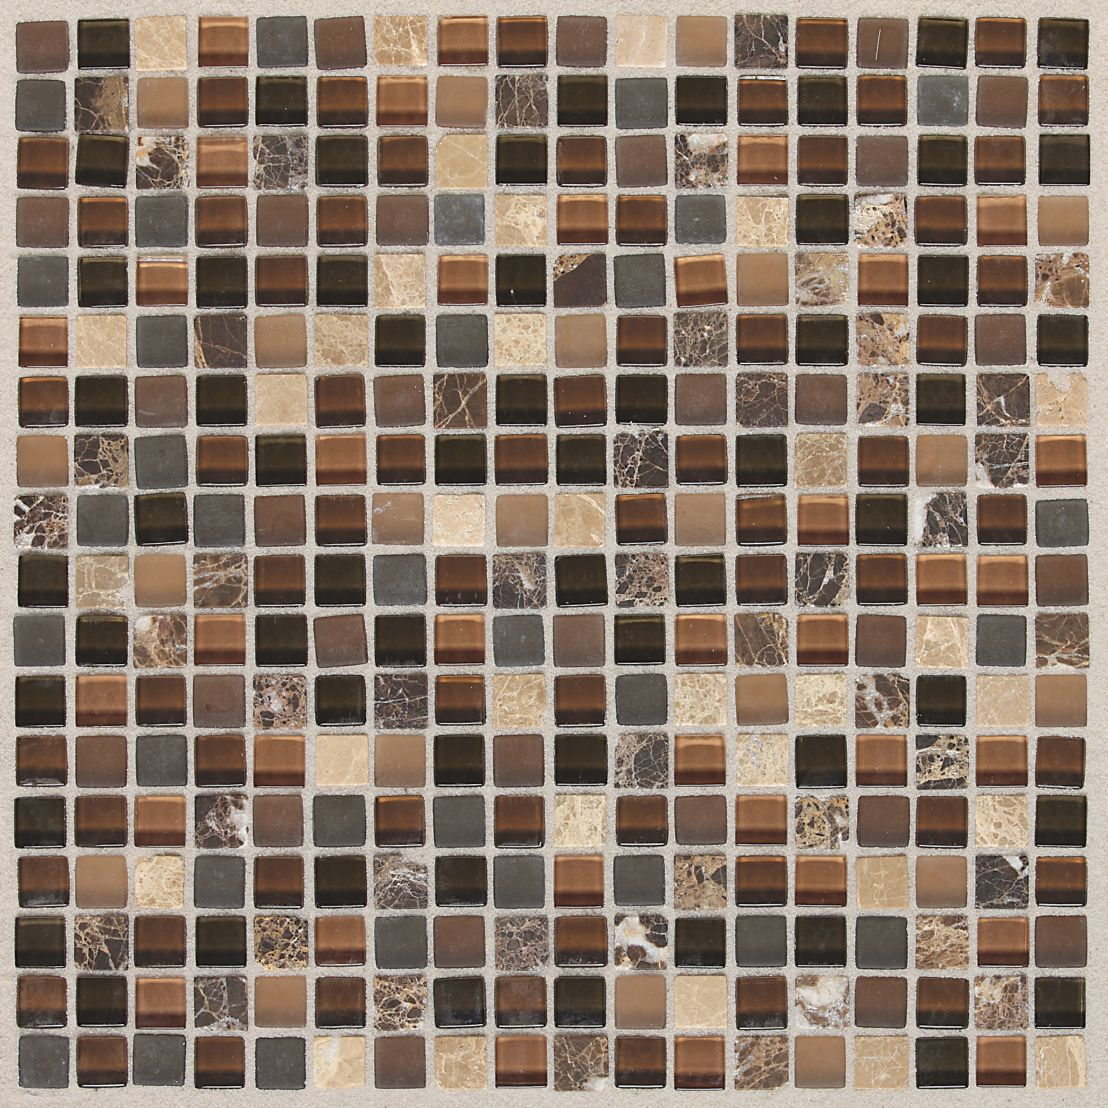 CeramicPorcelainTile Maraval Stone Brown Toffee  thumbnail #1